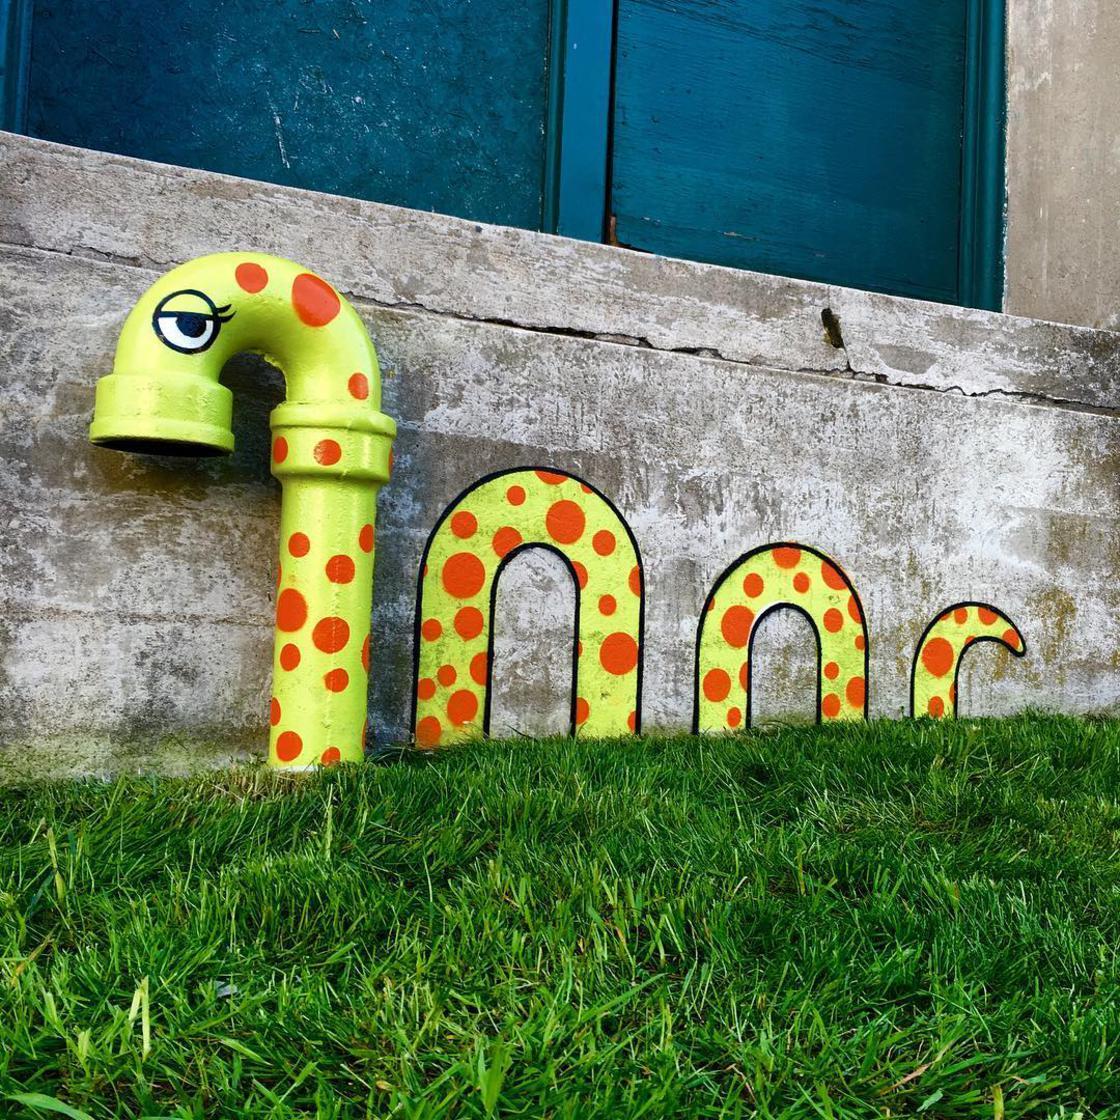 tom-bob-street-art-new-york-17.jpg